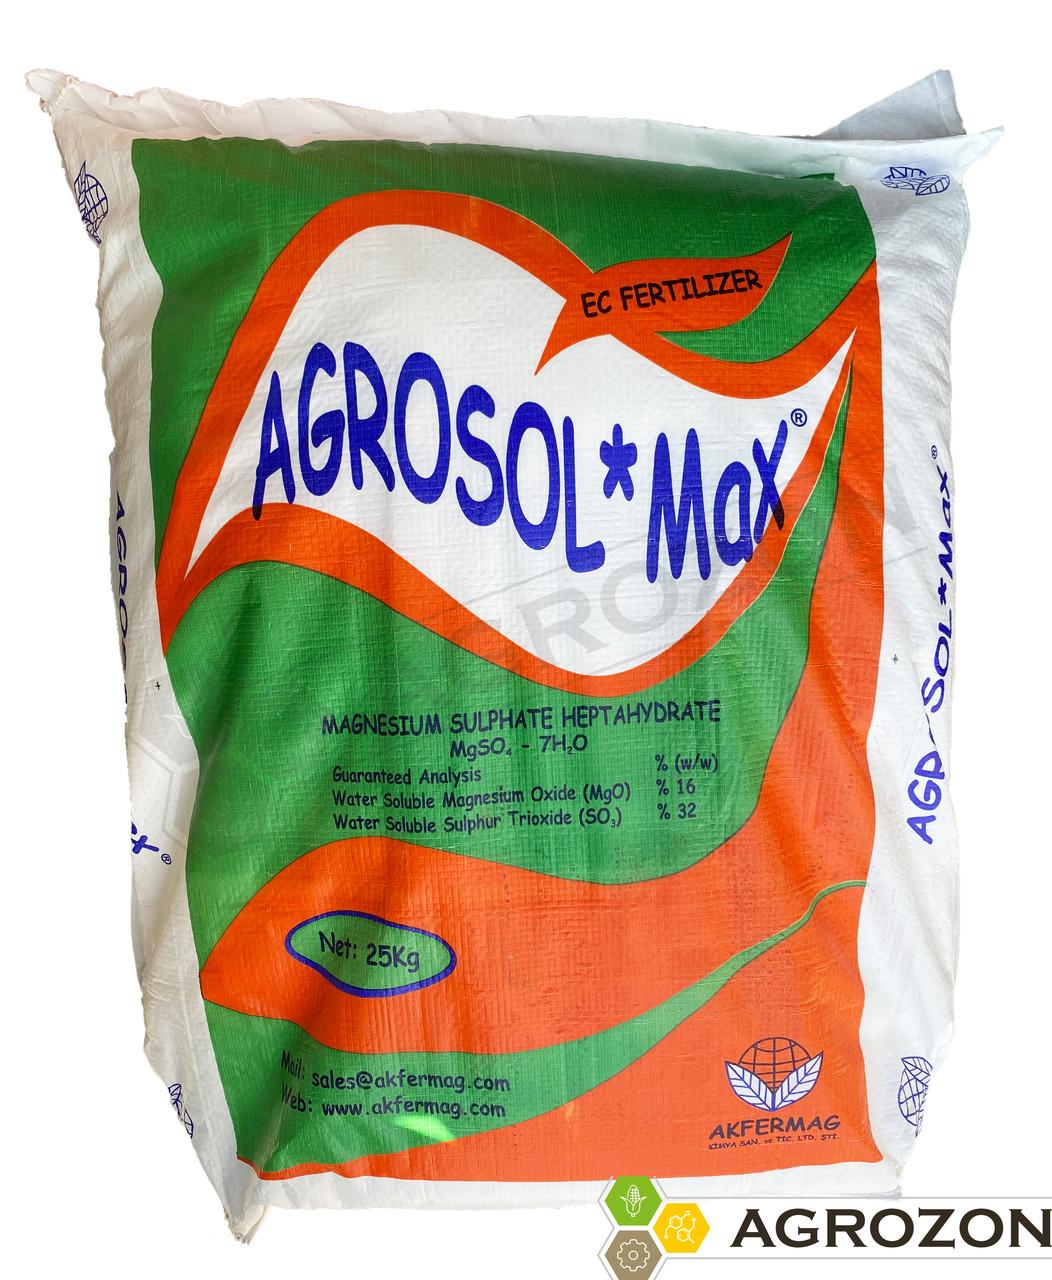 Сульфат магния AGROSOL MAX (Турция) Akfermag - 25 кг